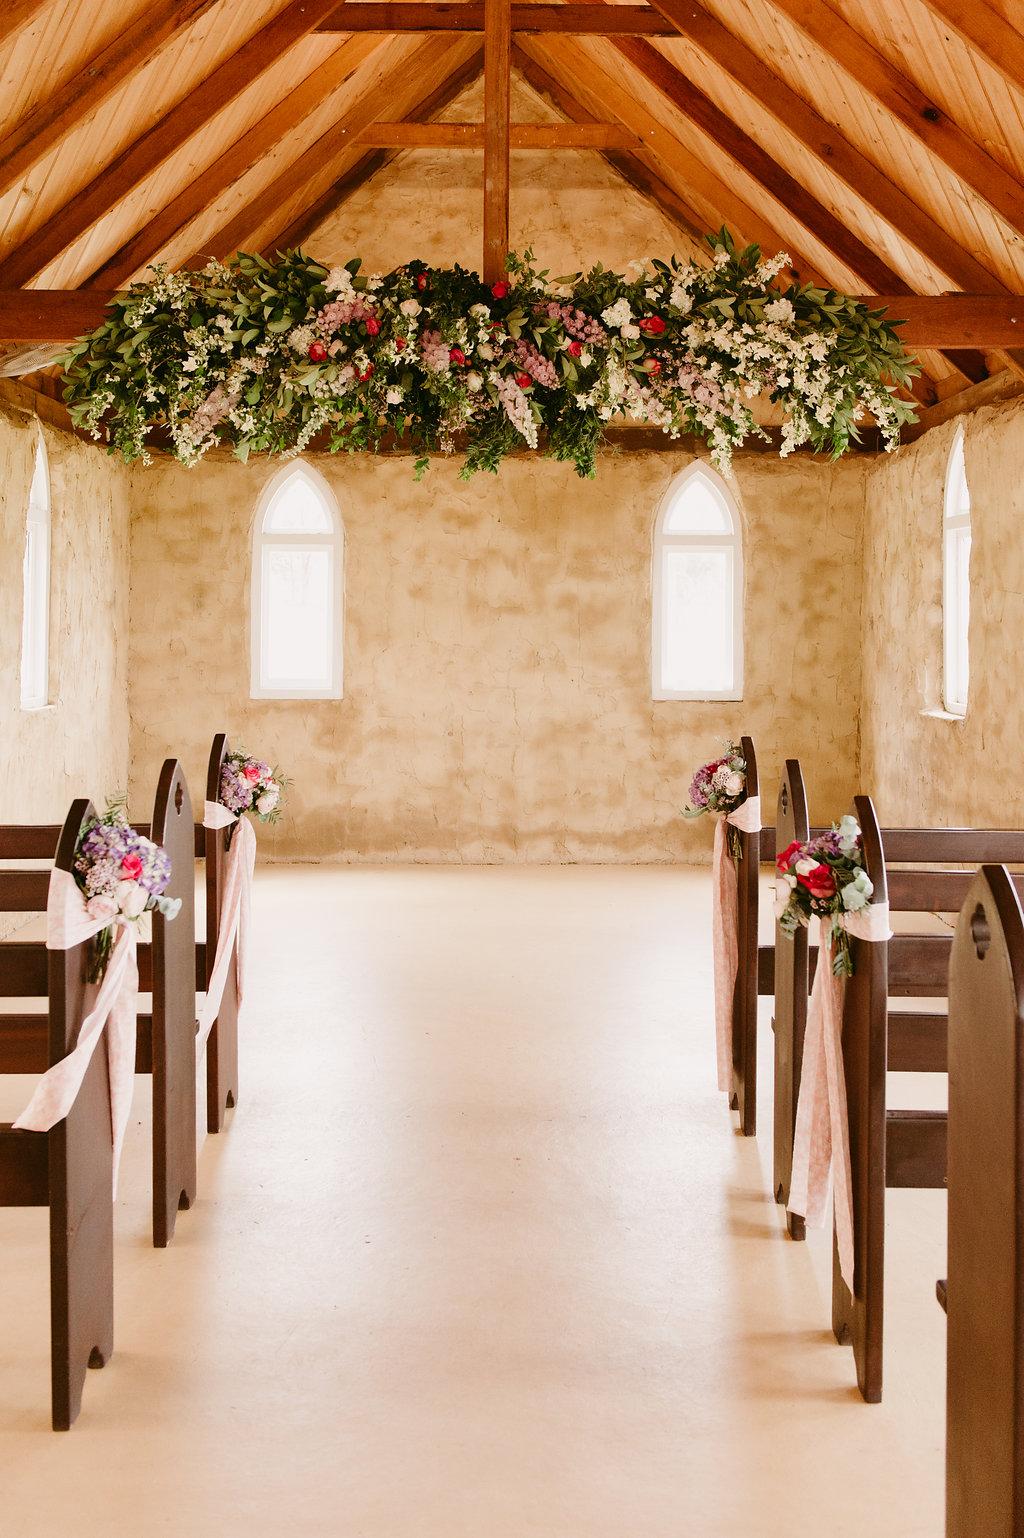 Hanging Flowers Installation & Ceremony Pew Flowers - Wedding Flowers Hunter Valley